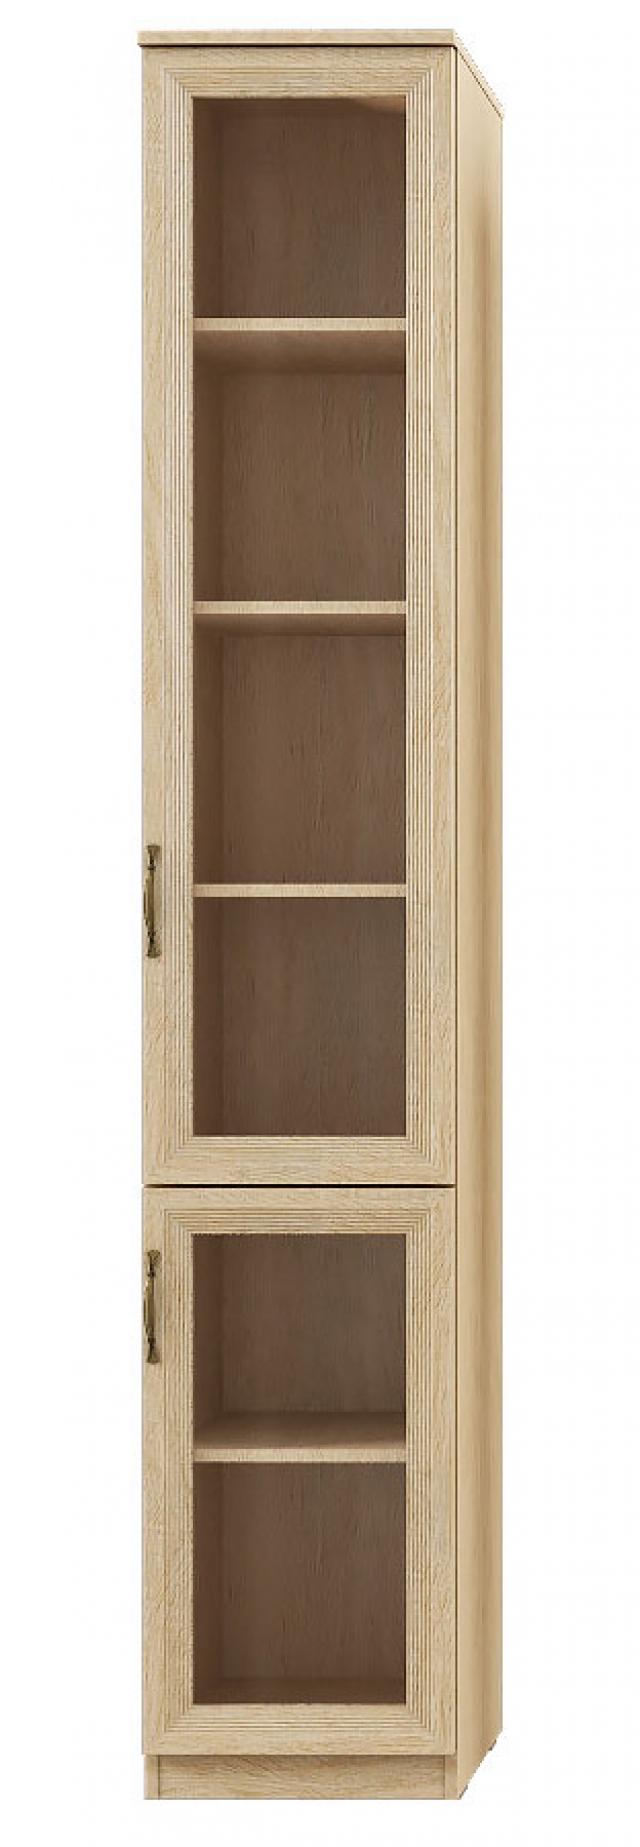 """Лира"" 113 Шкаф-пенал 2-двер, фасады СТЕКЛ - 5607"